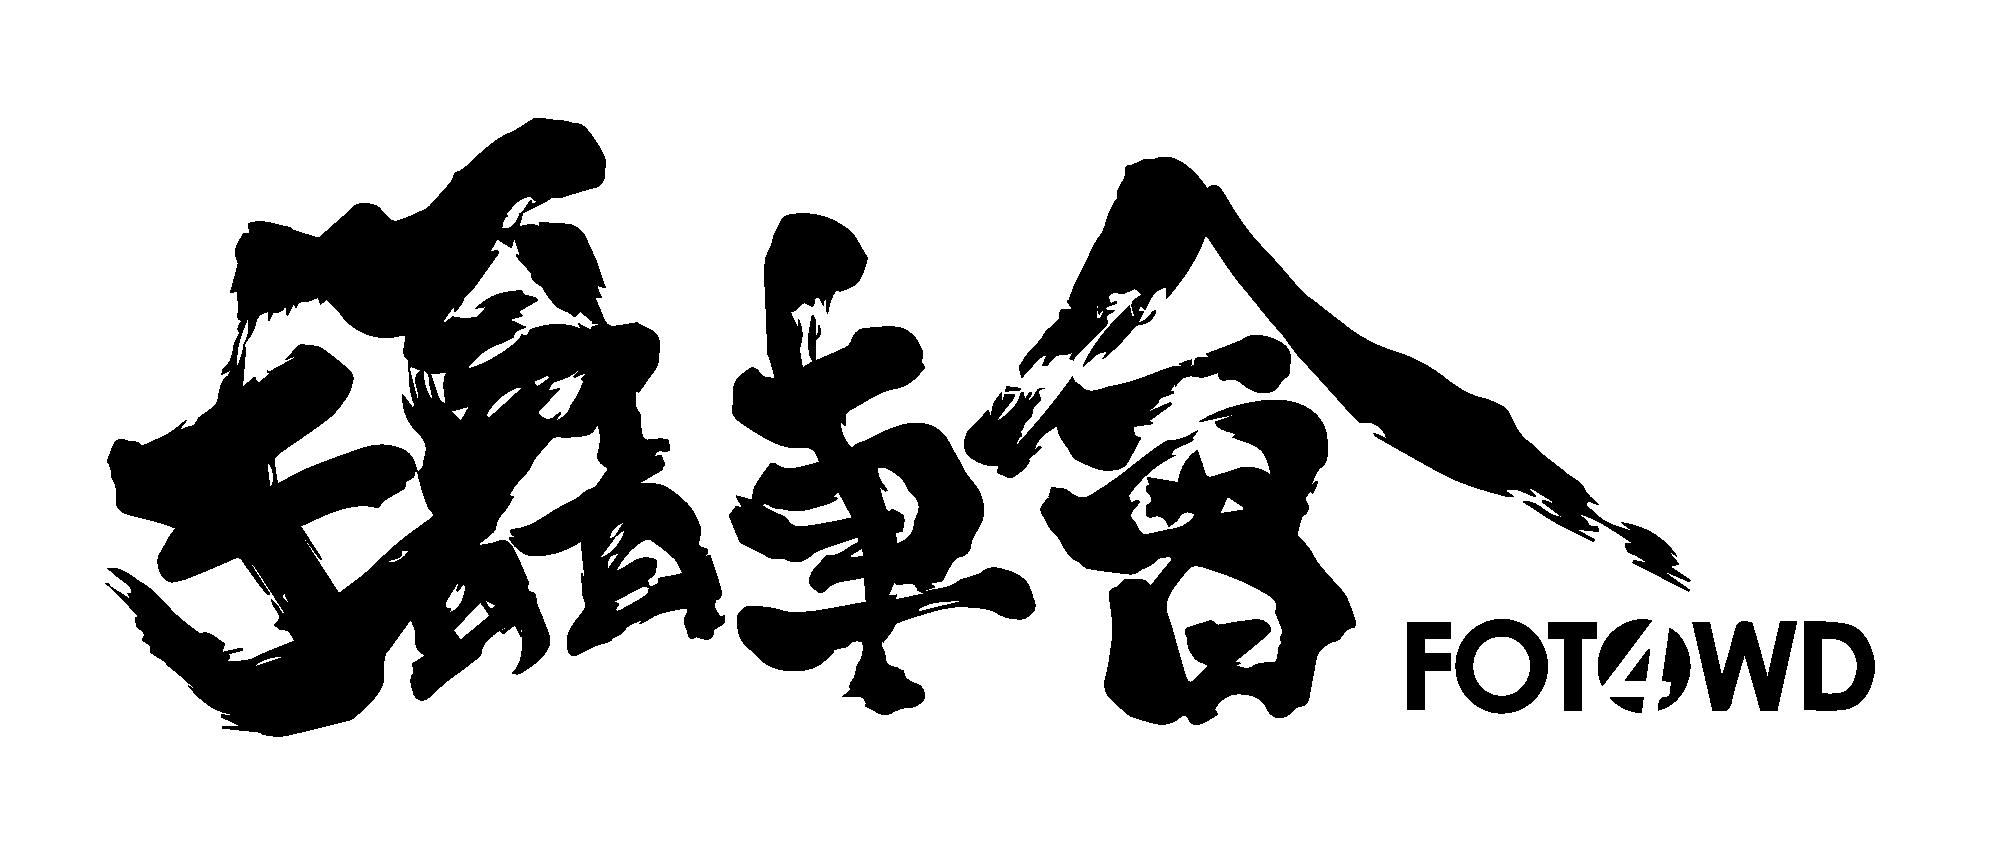 FOT4WD_Logo-01